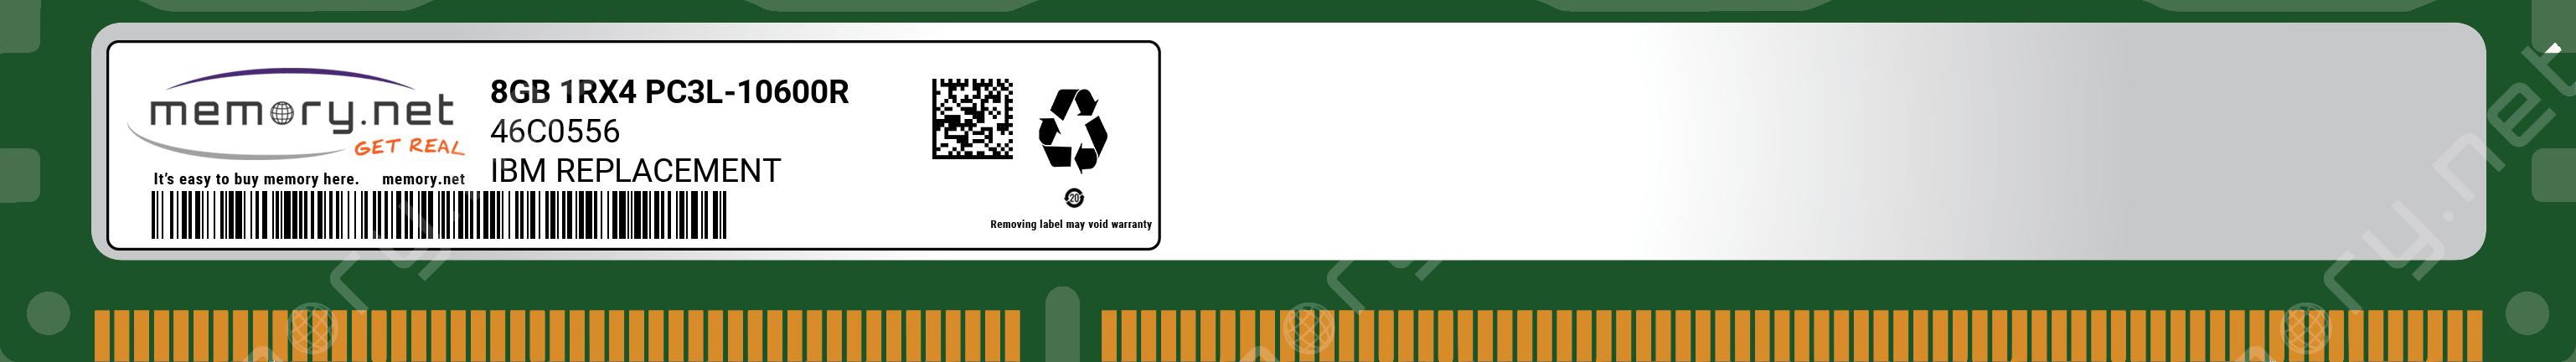 46C0556